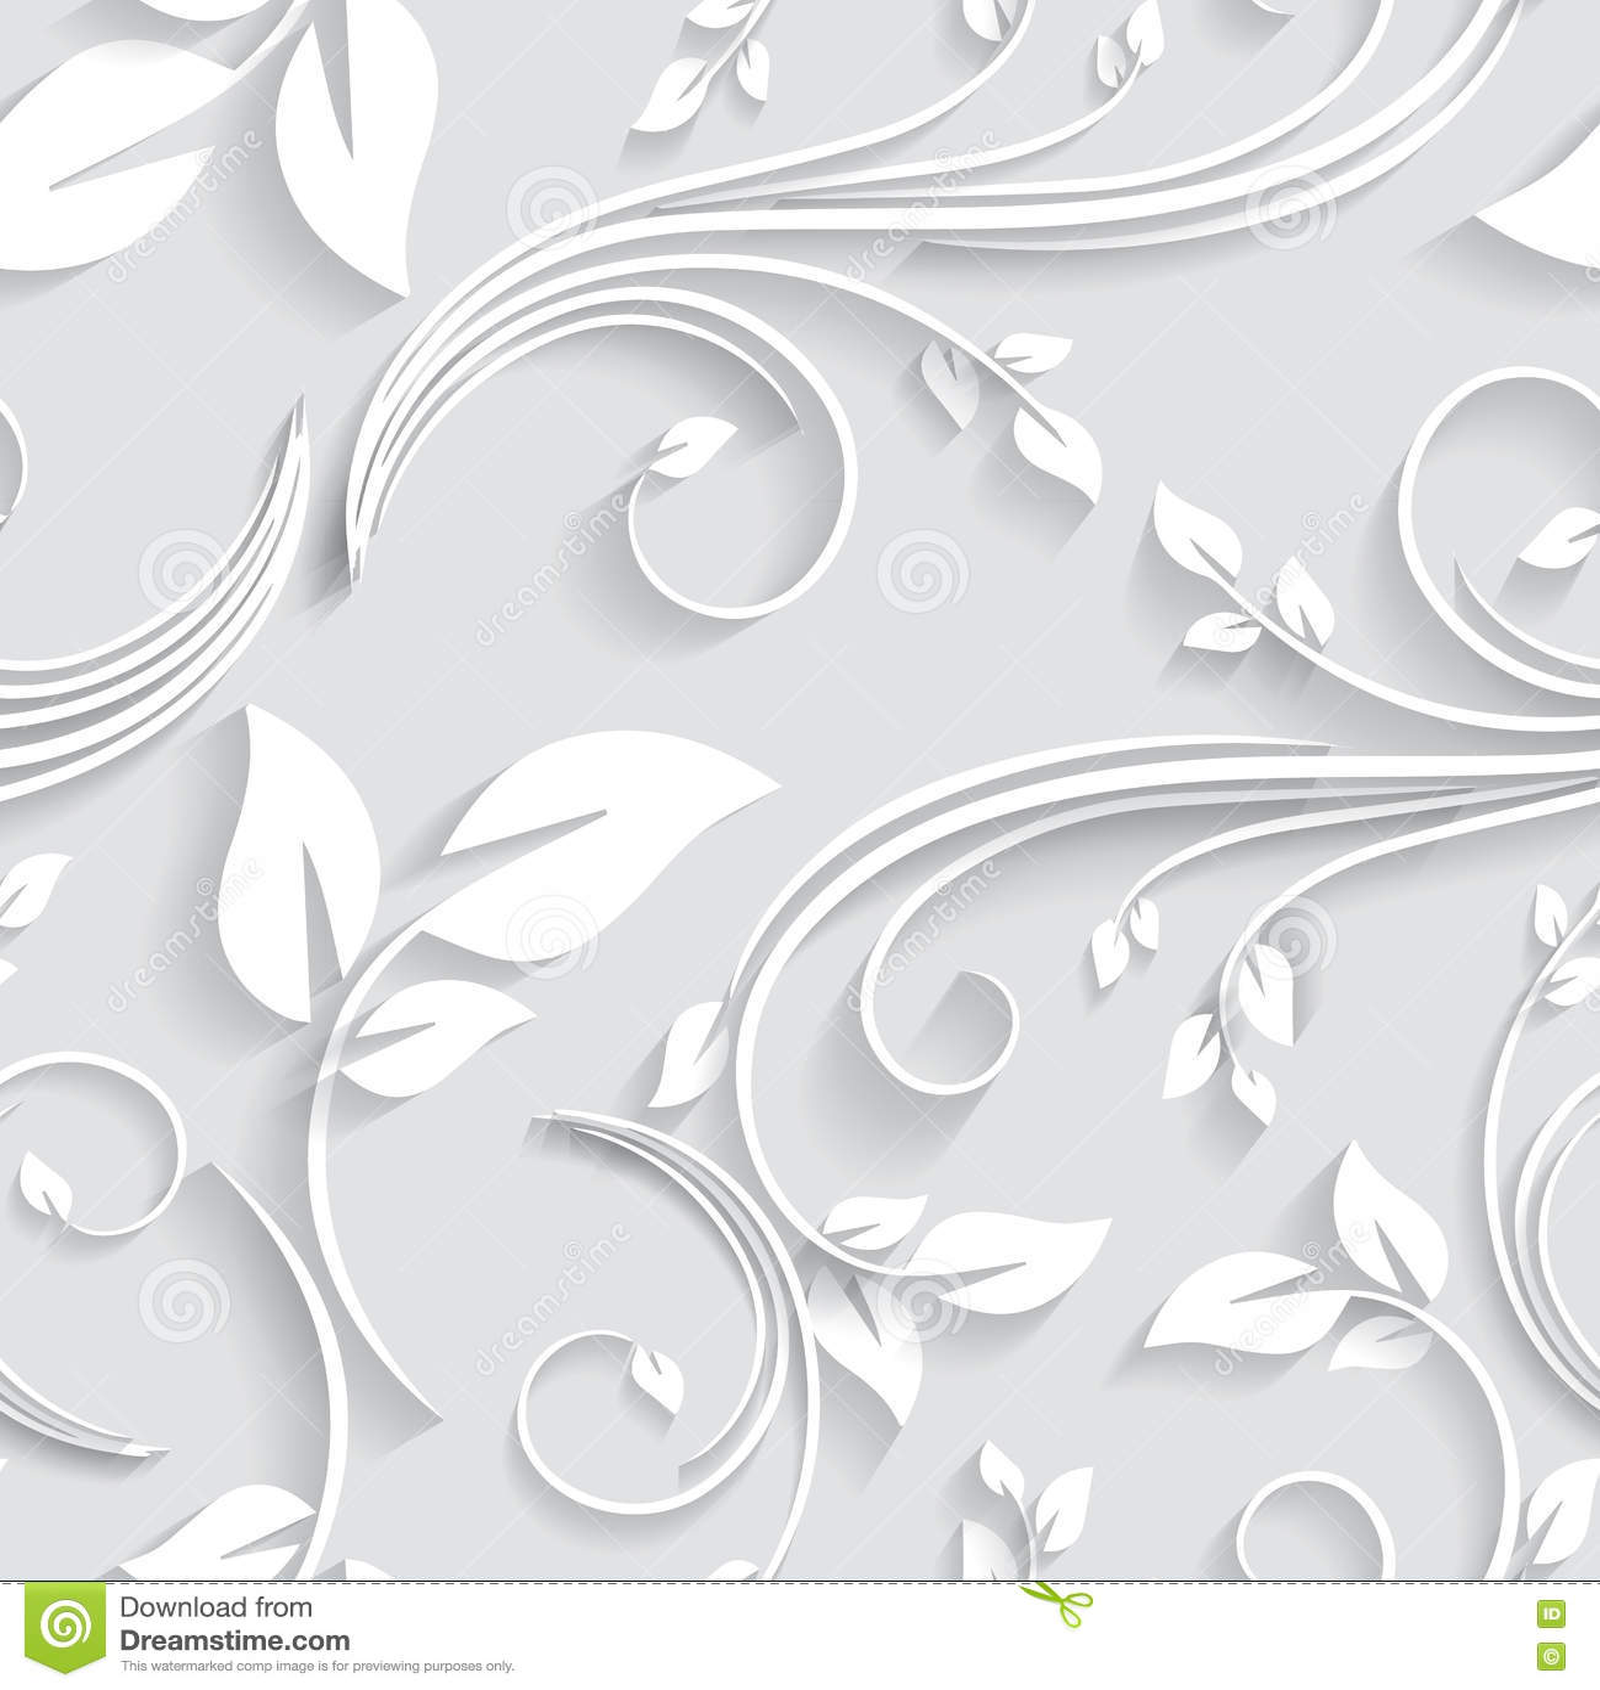 Wedding Paper: Seamless Floral Wedding Card Background Cartoon Vector